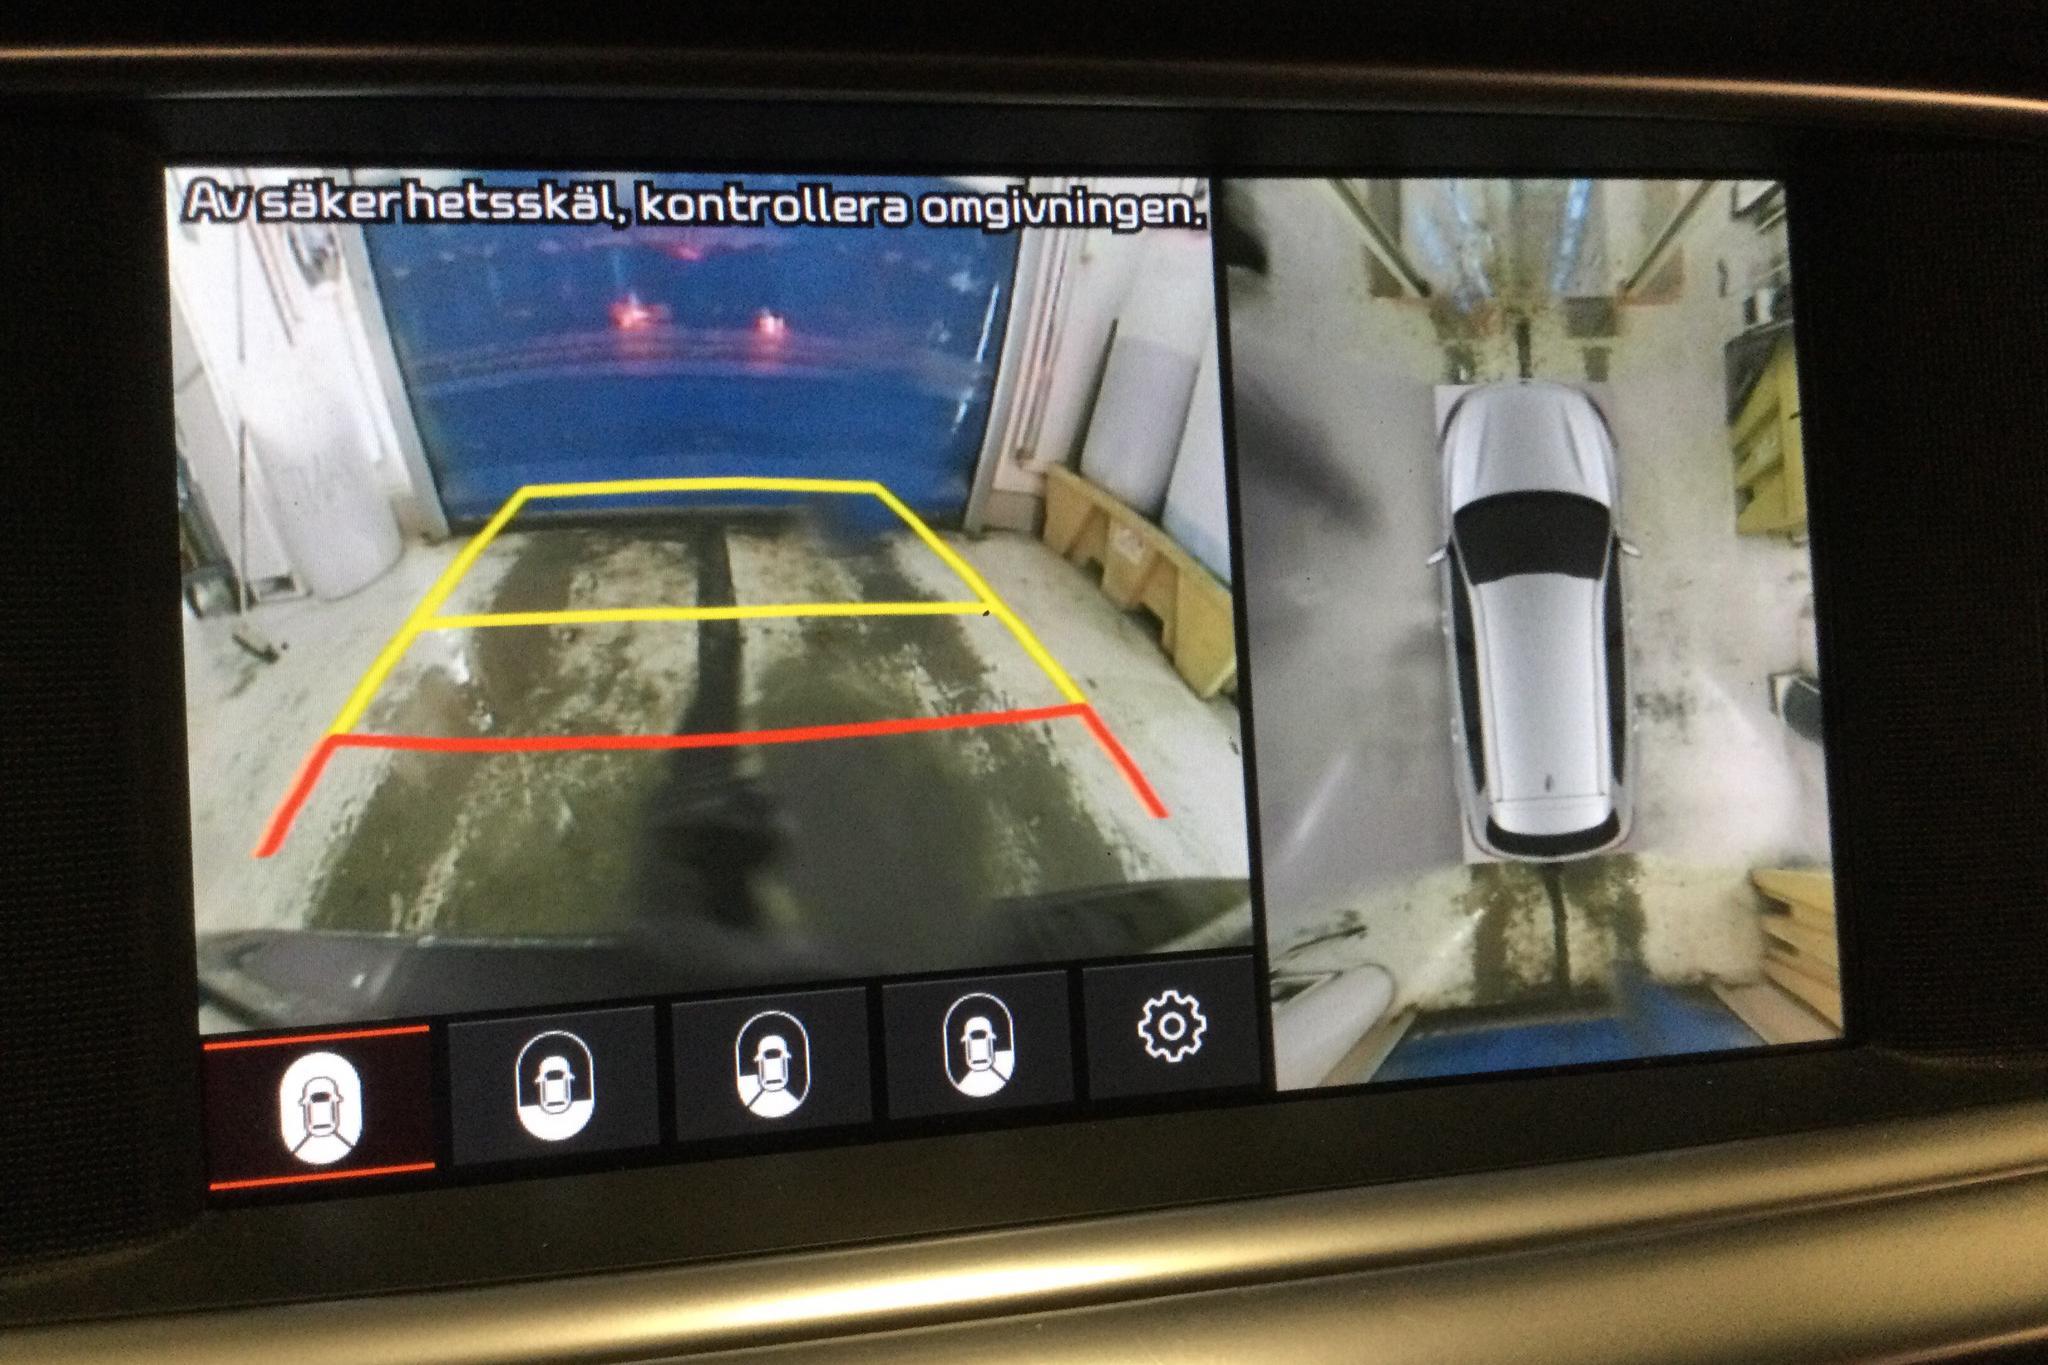 KIA Optima 2.0 GDi Plug-in Hybrid SW (205hk) - 37 590 km - Automatic - gray - 2019